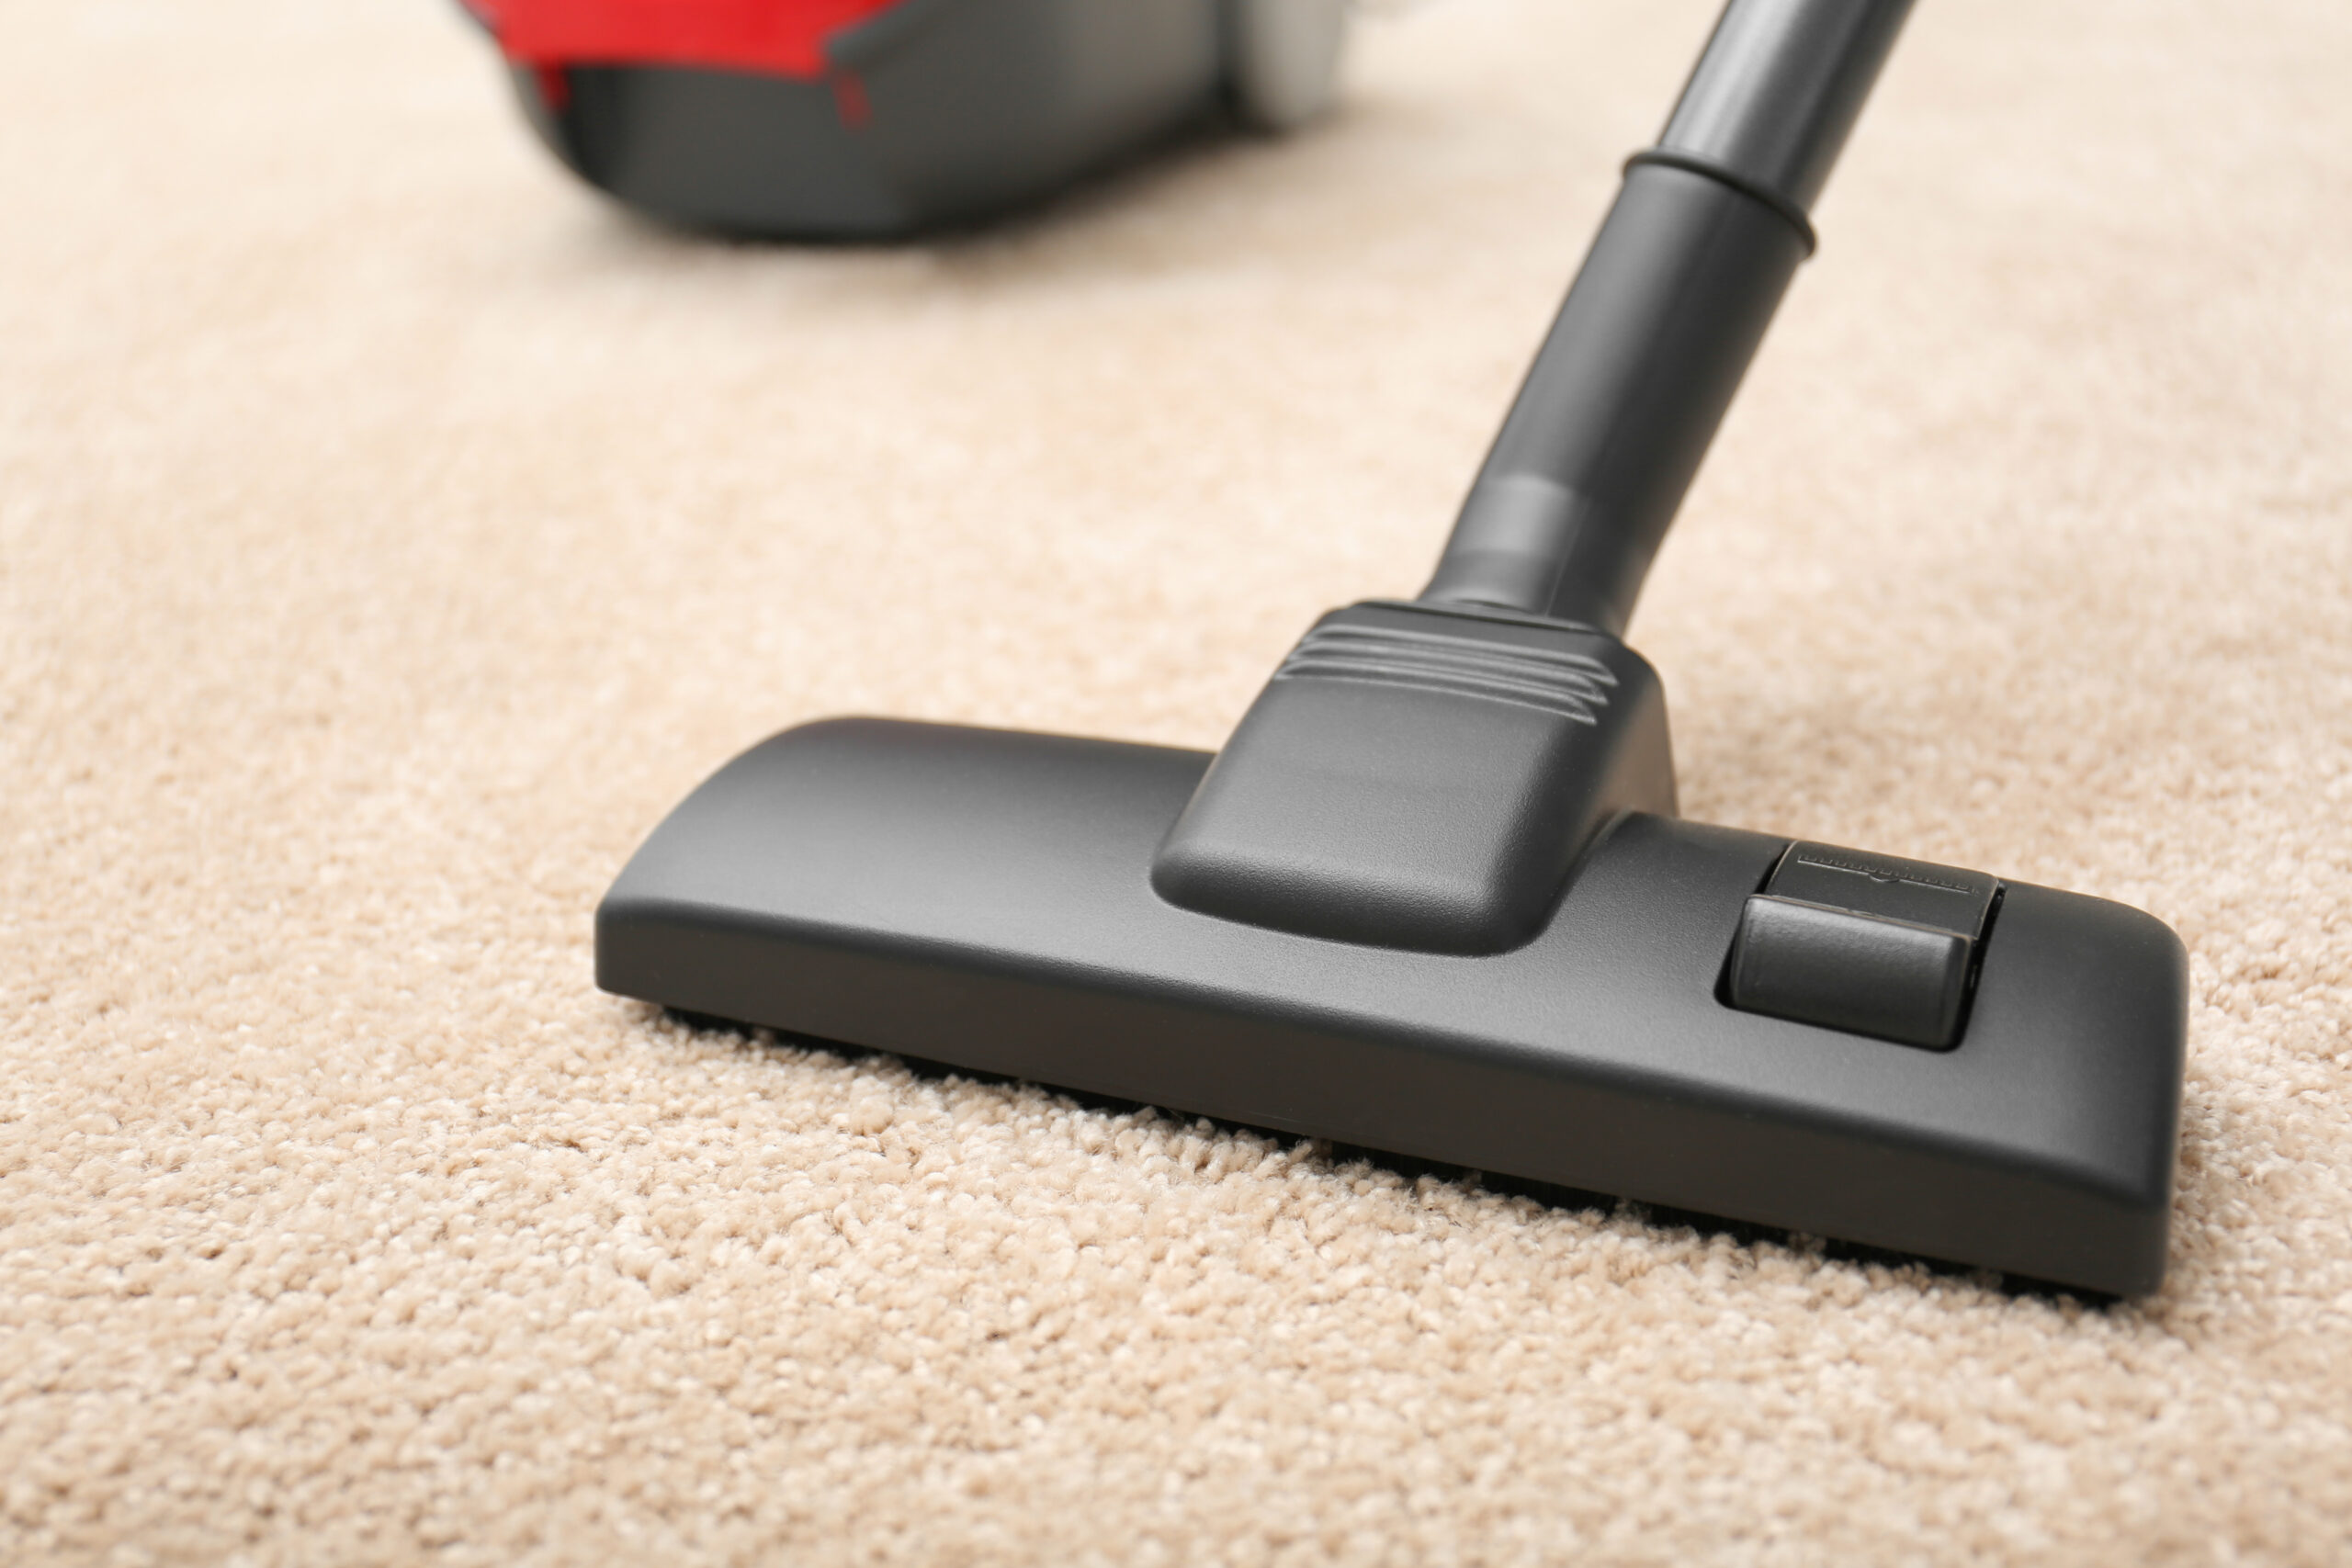 vacuum cleaning carpet with DIY carpet cleaner